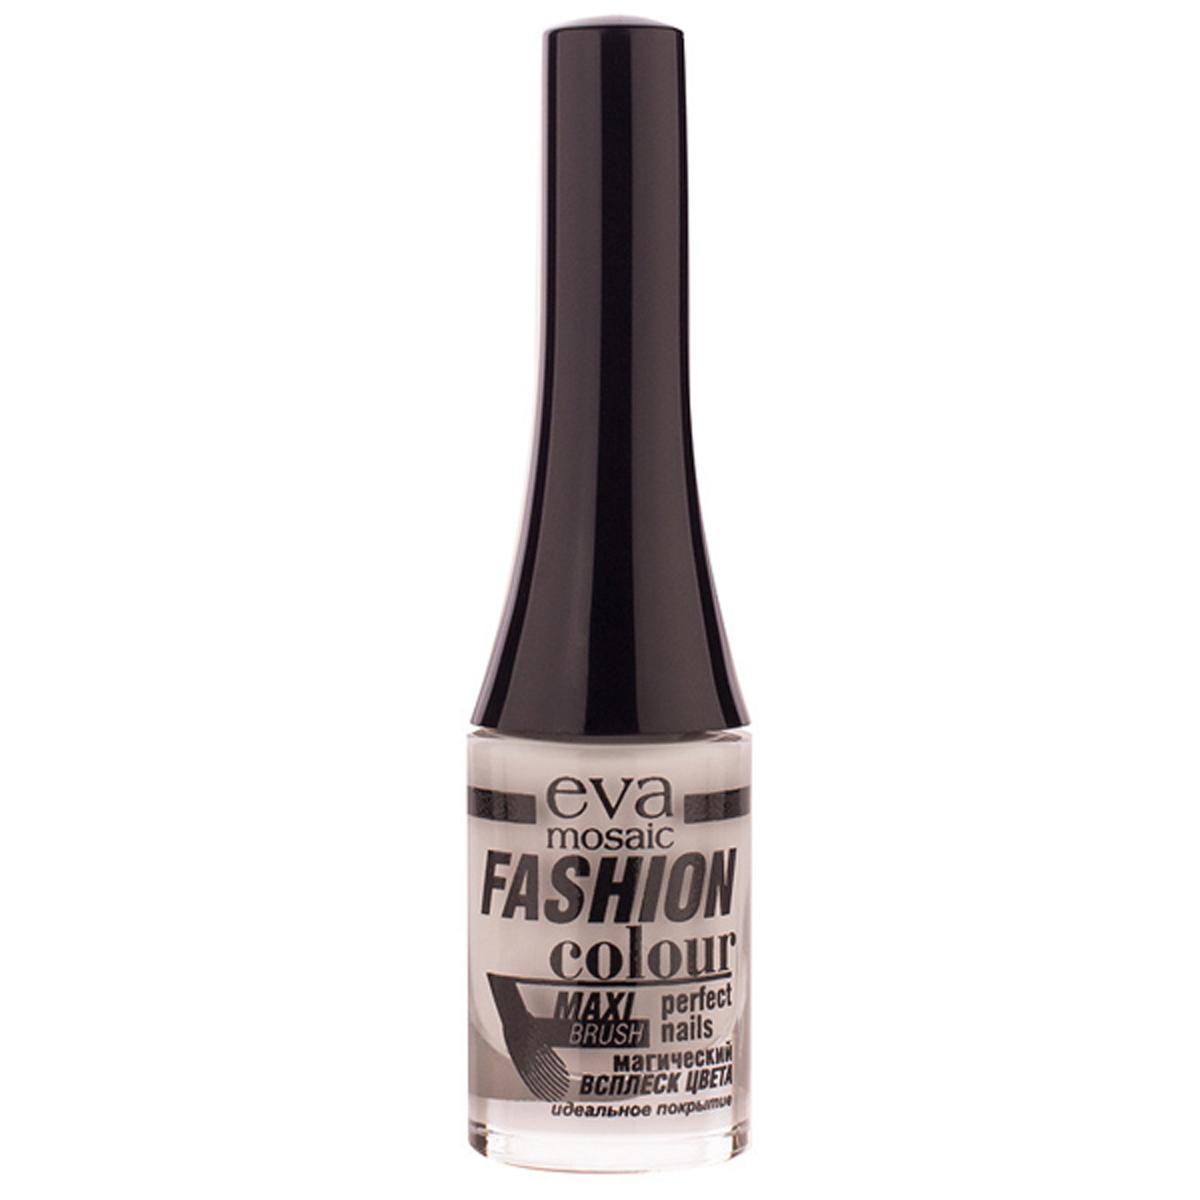 Eva Mosaic Лак для ногтей Fashion Colour, 6 мл, 053 Китайский Фарфор